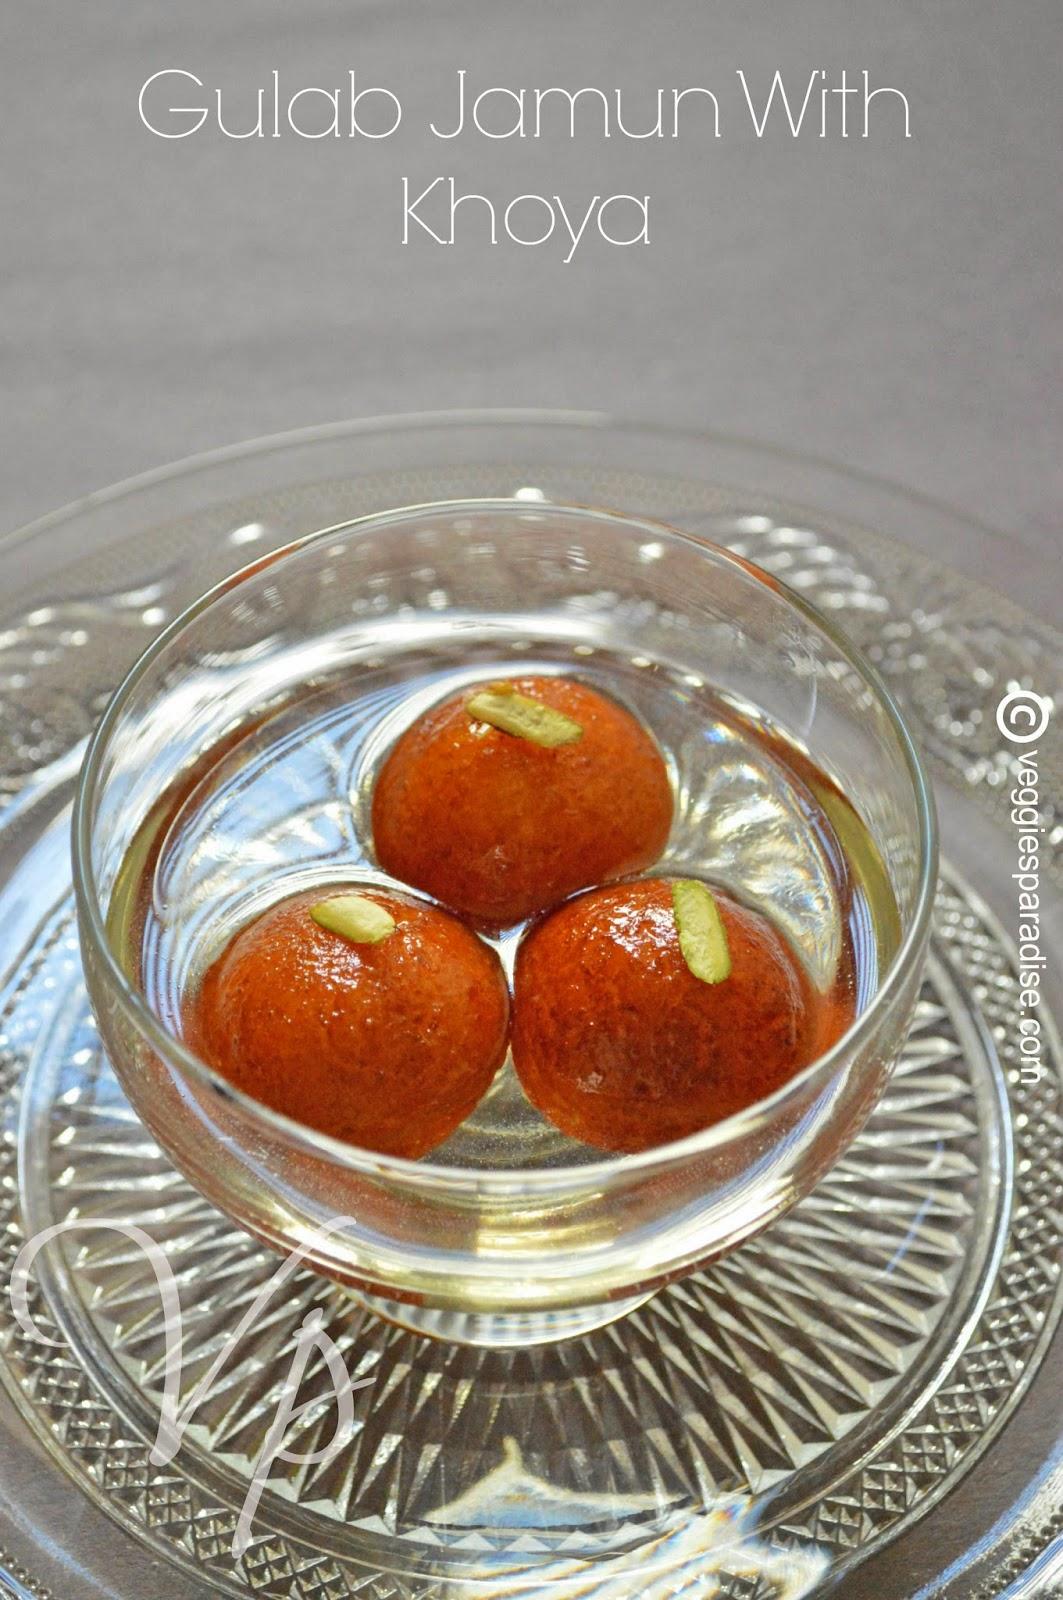 Gulab Jamun Recipe With Video Gulab Jamun With Khoya